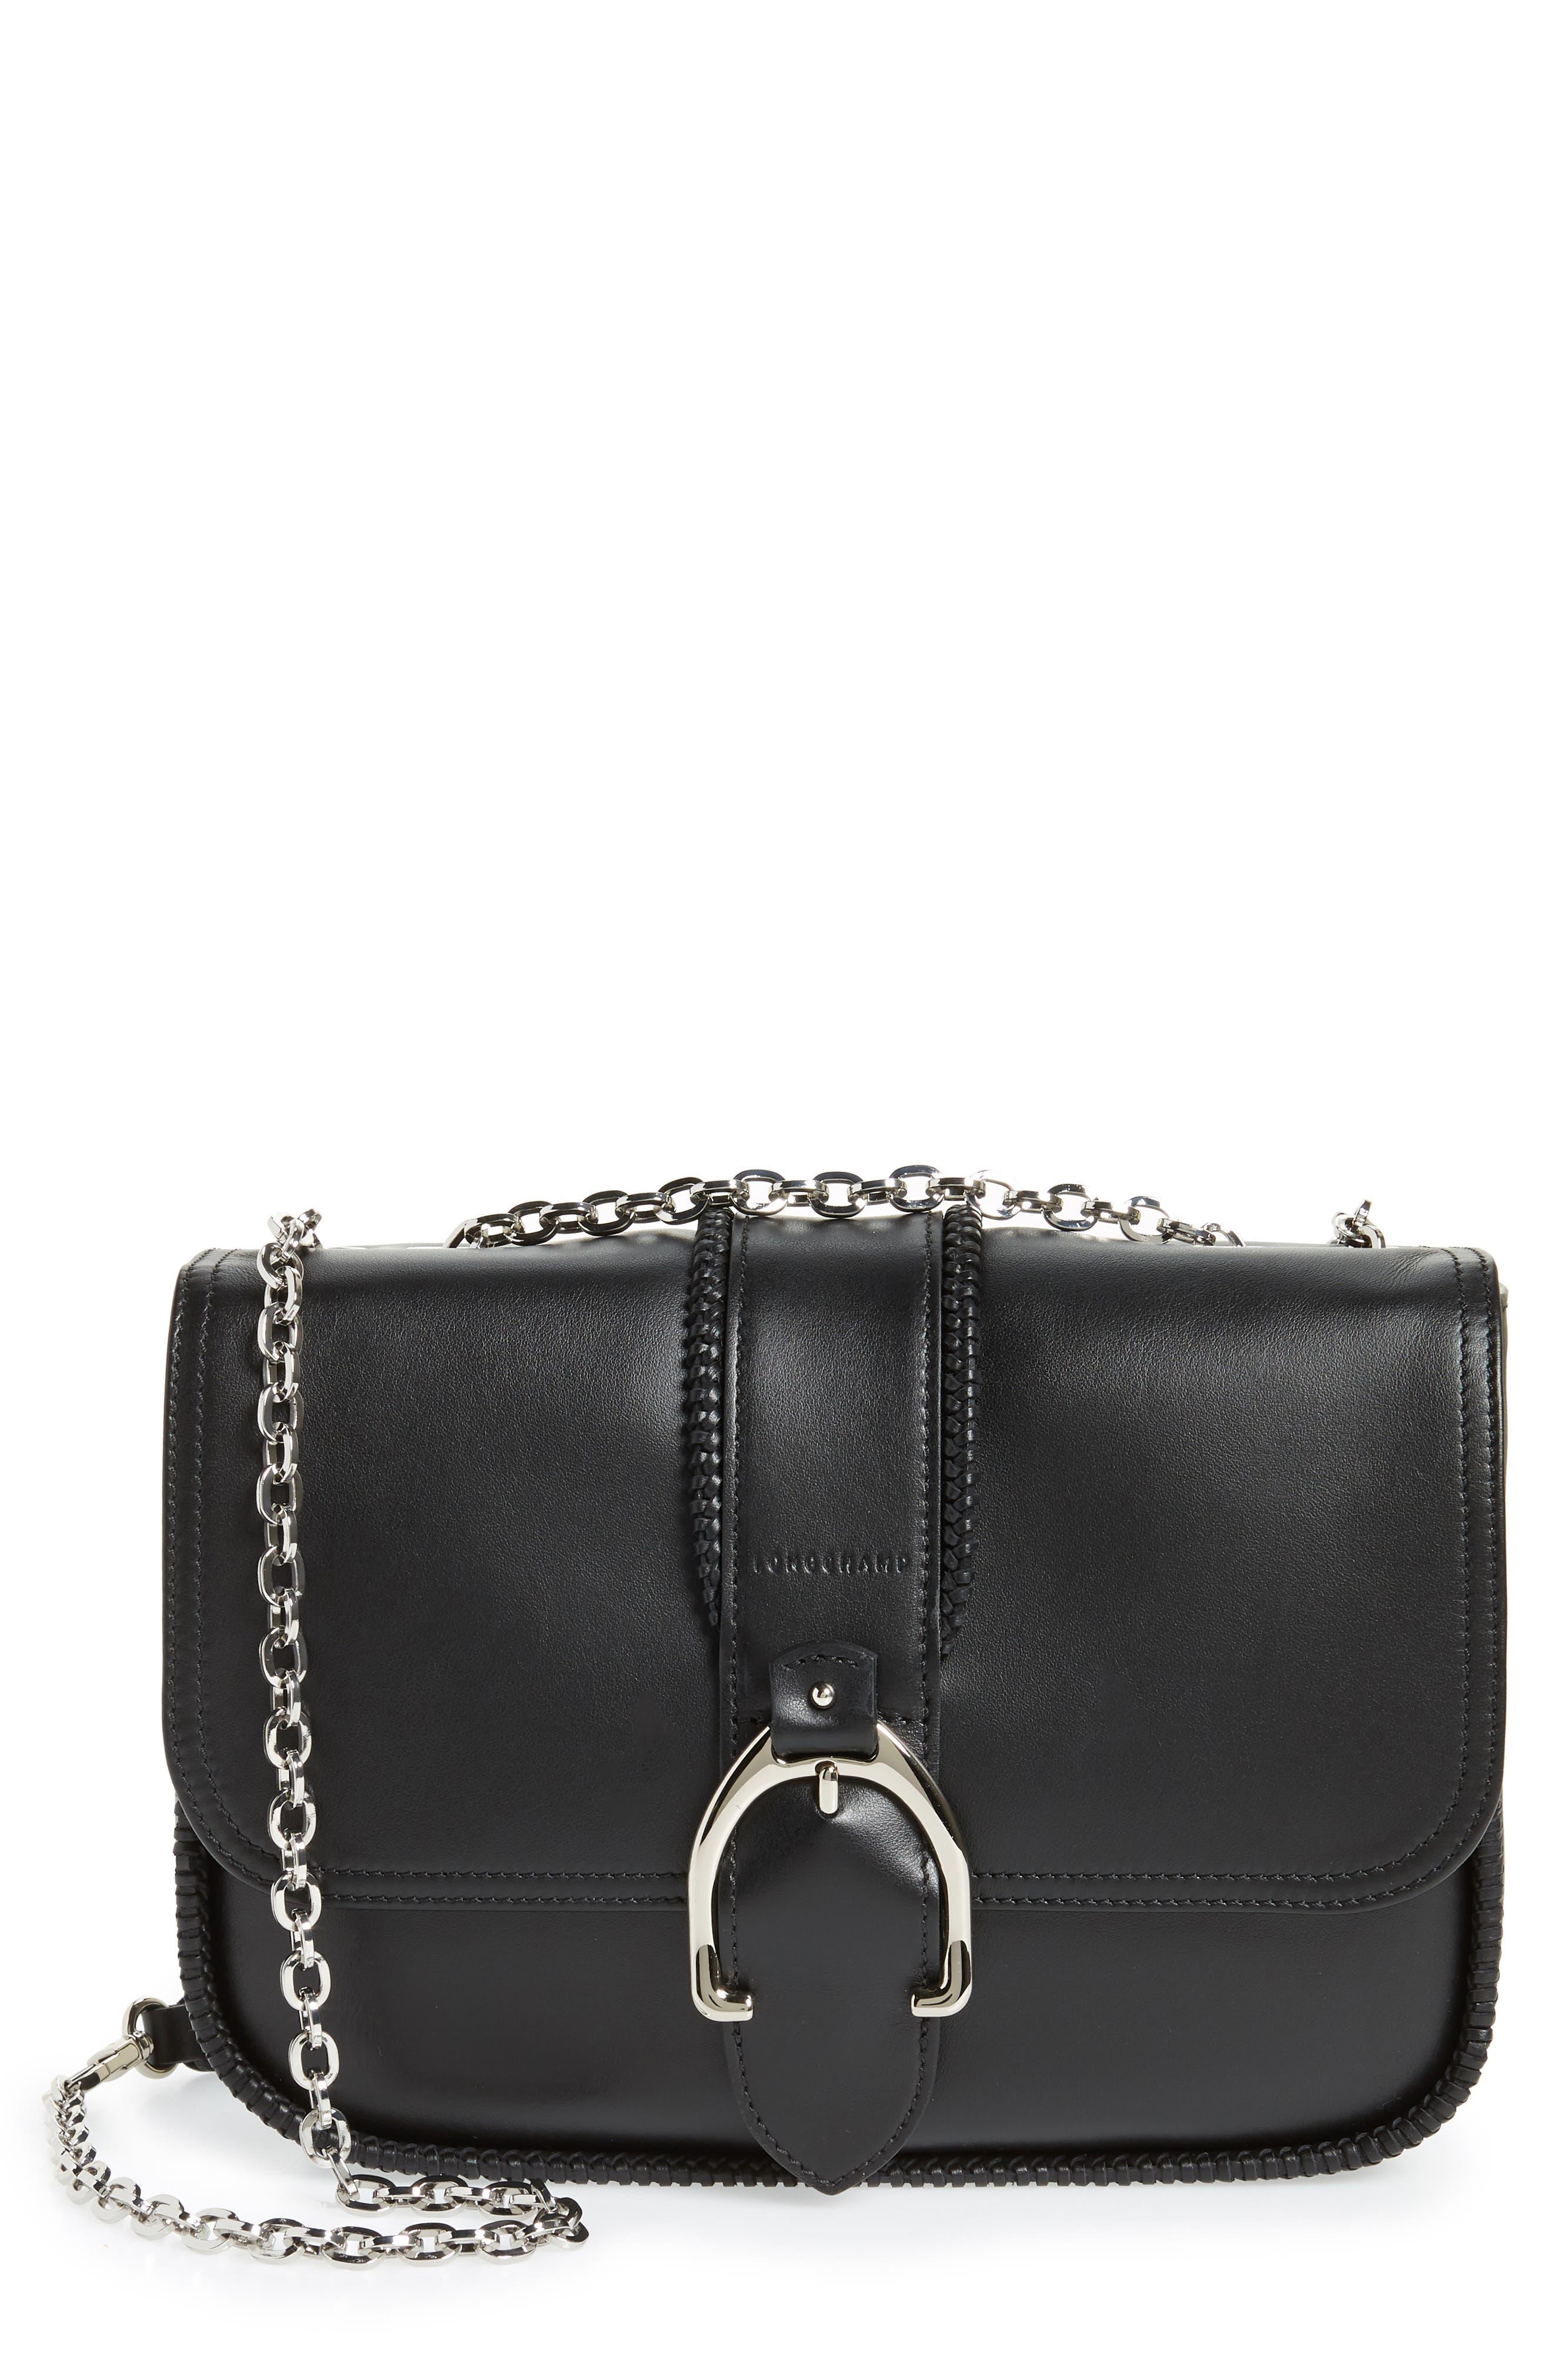 Longchamp Small Leather Crossbody Bag